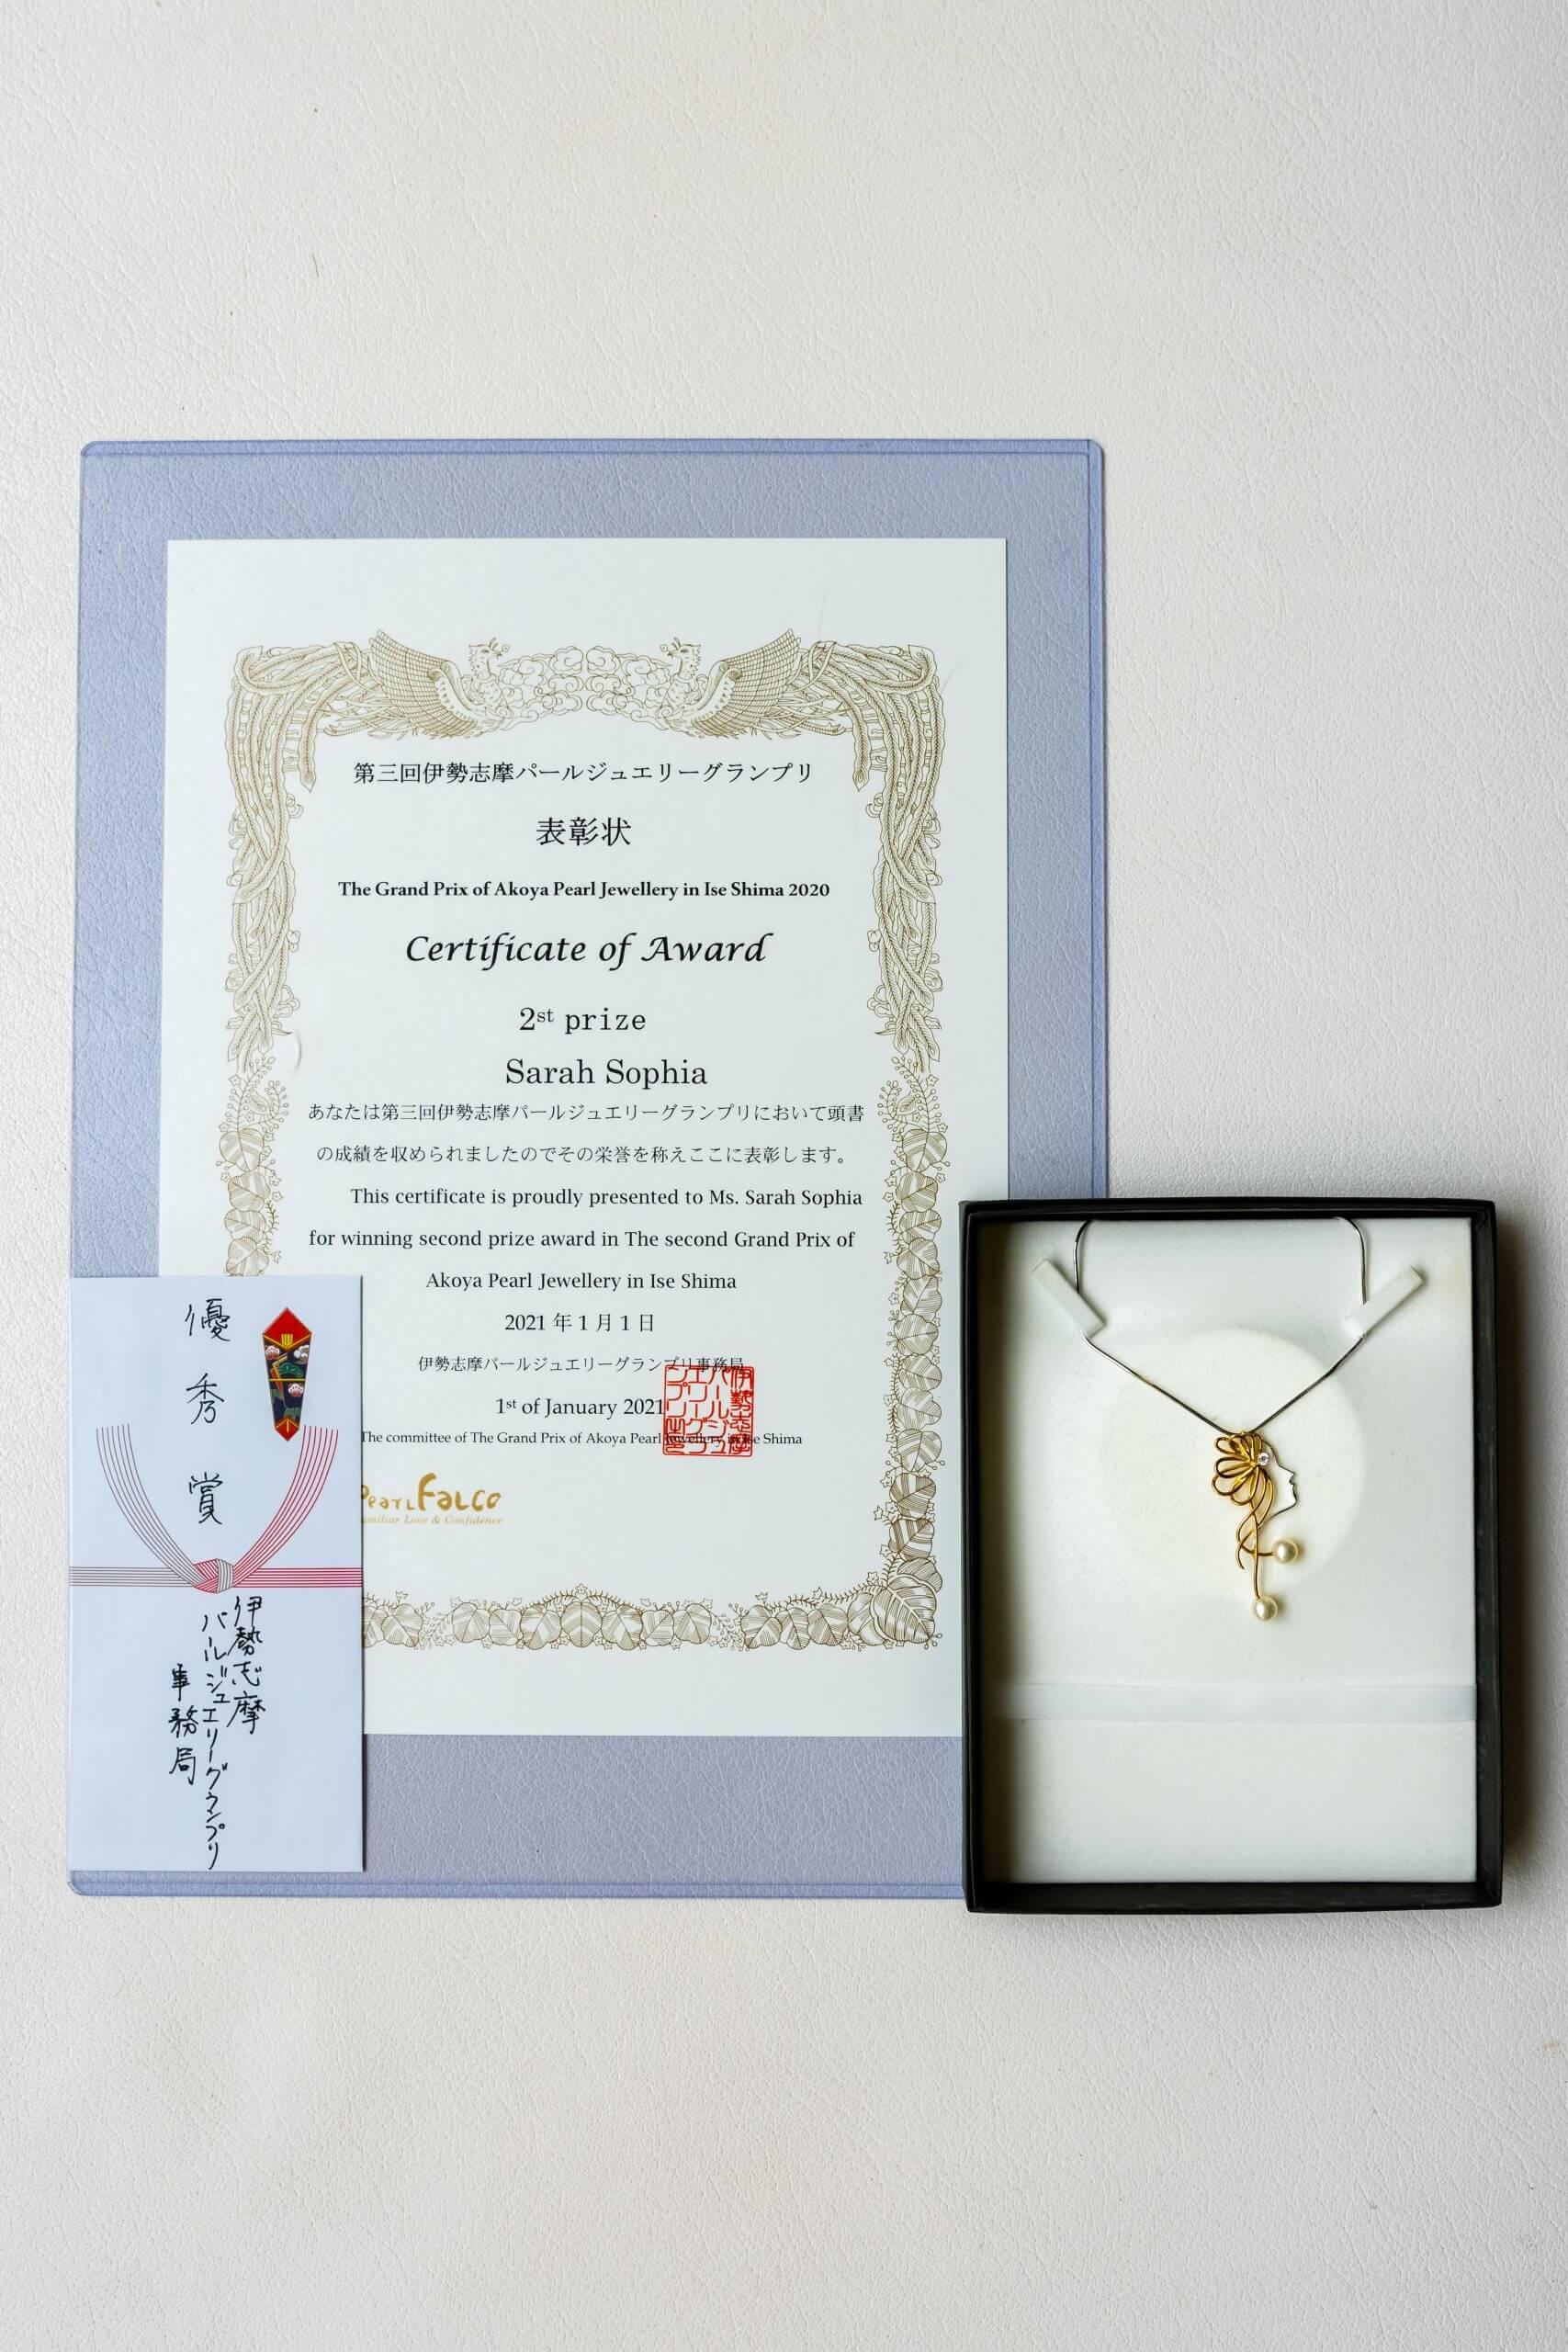 award certificate for sarah sophia